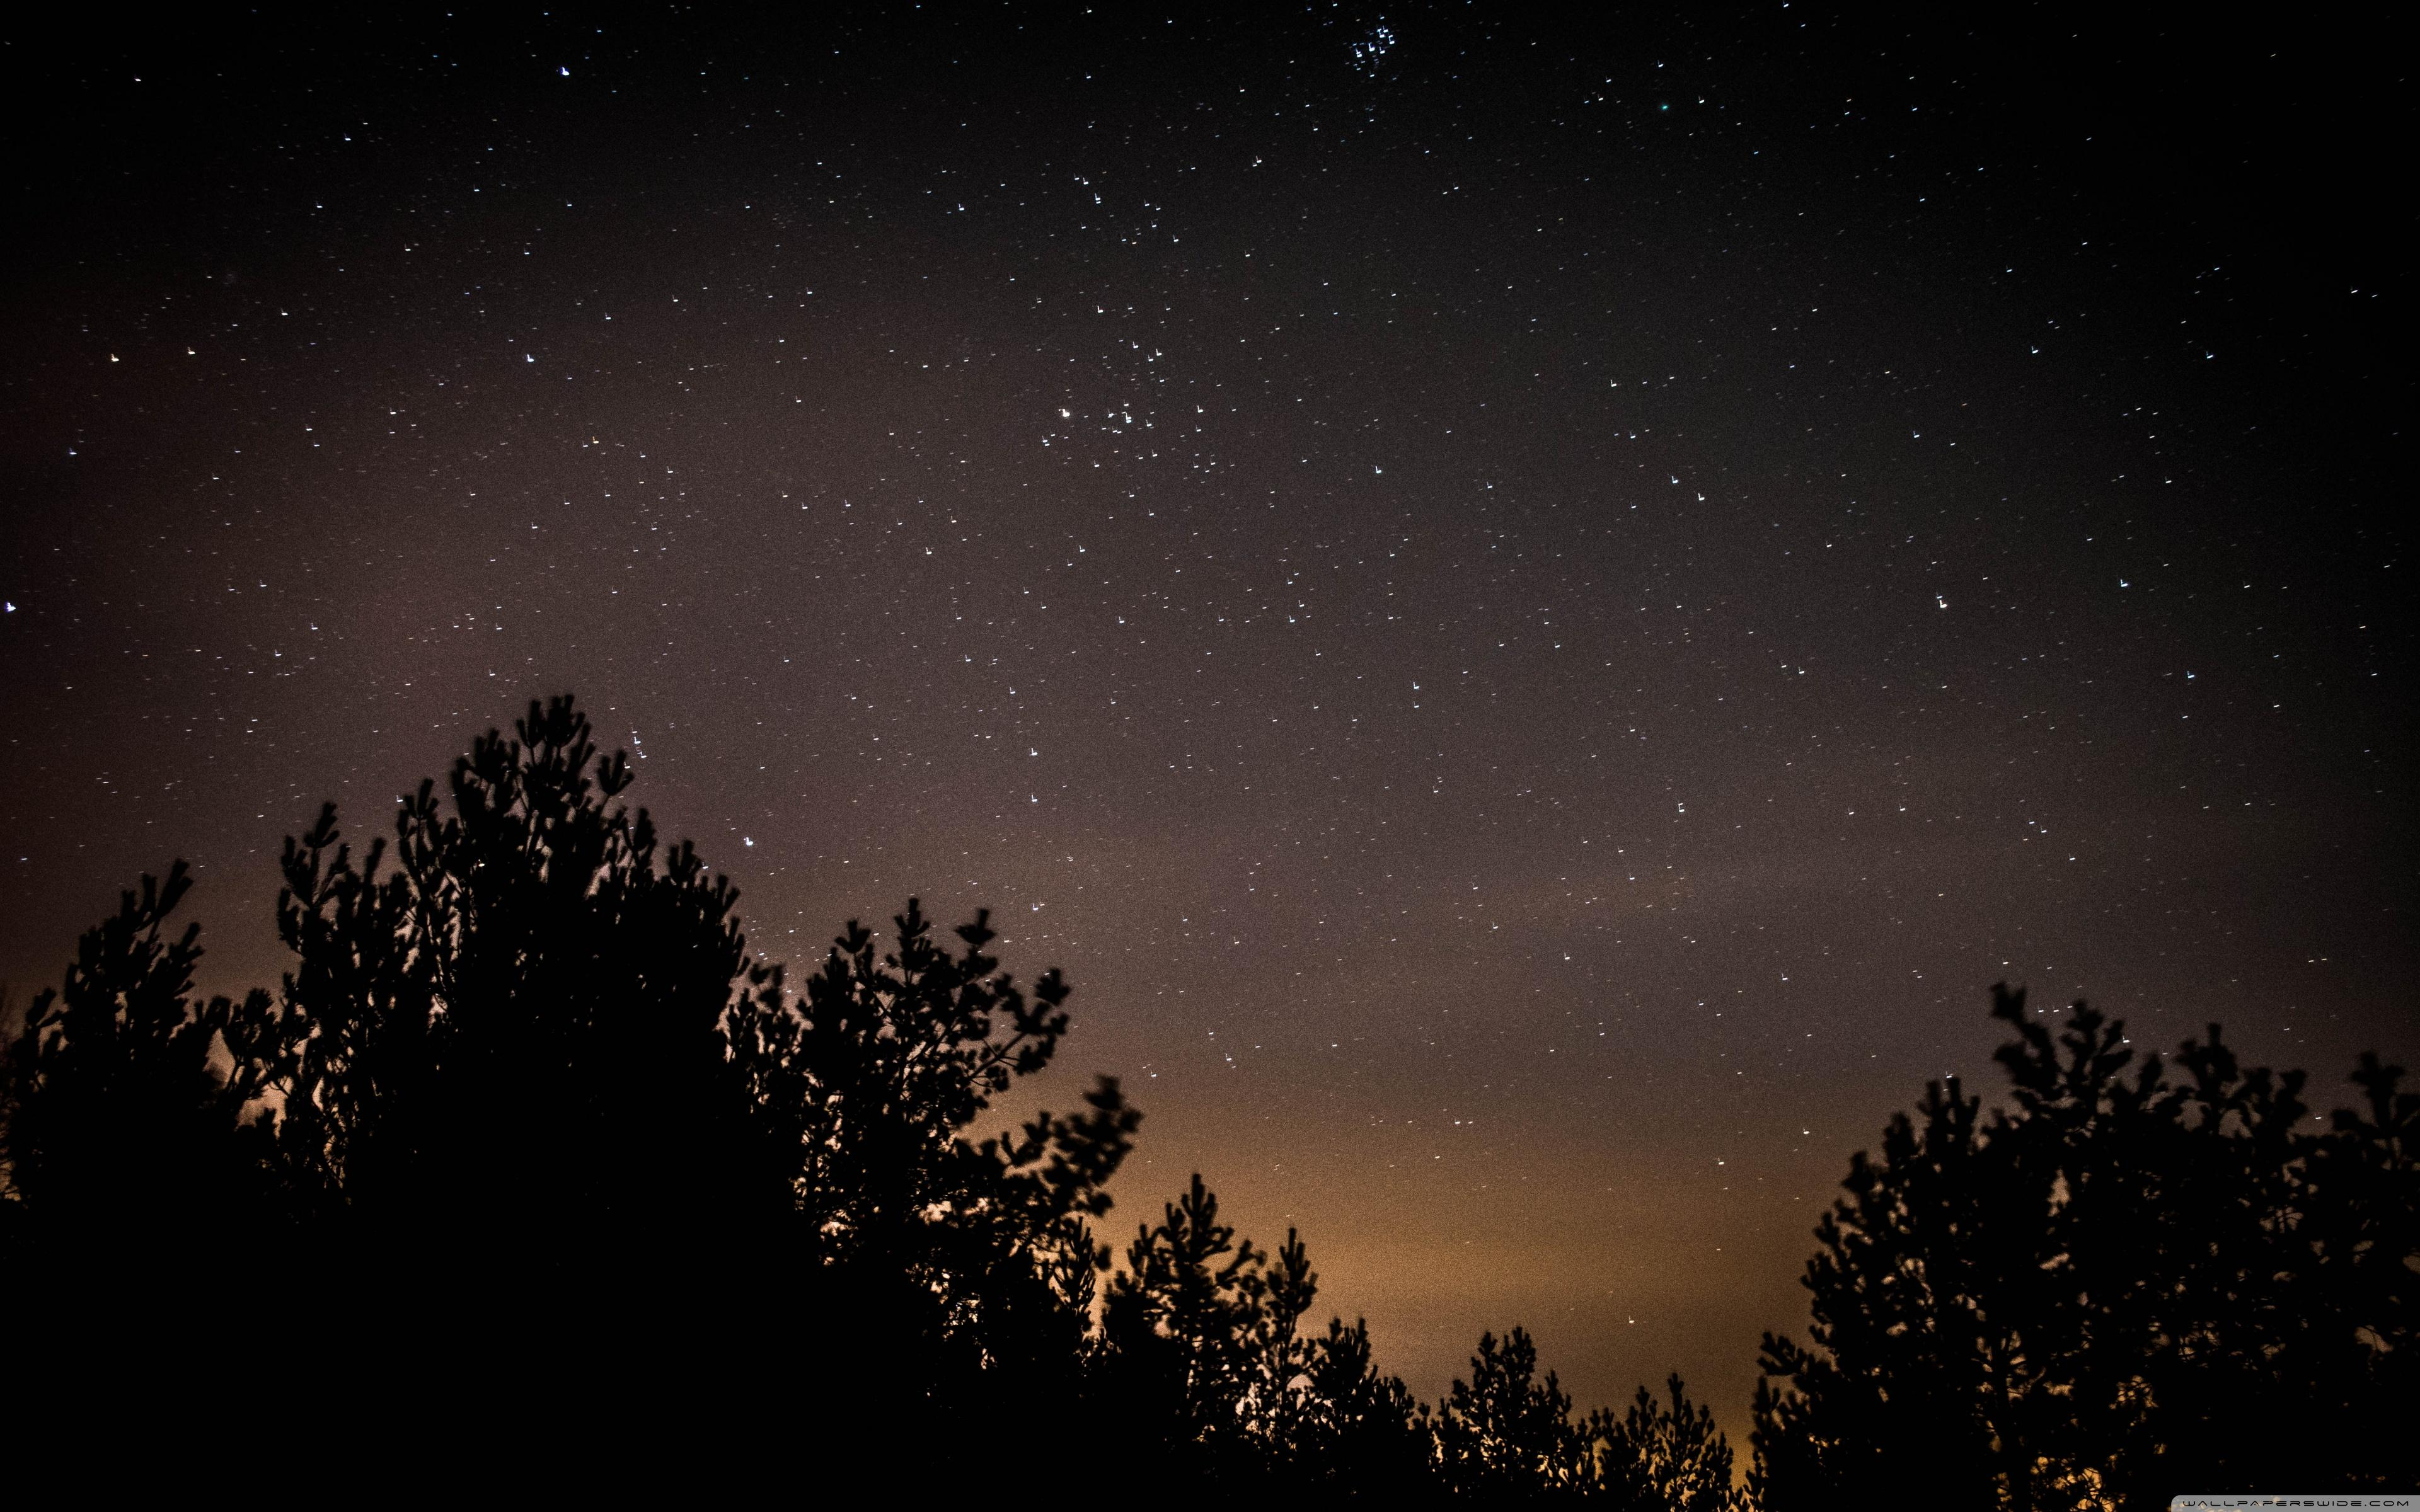 Sky Full Of Stars Wallpapers Wallpaper Cave